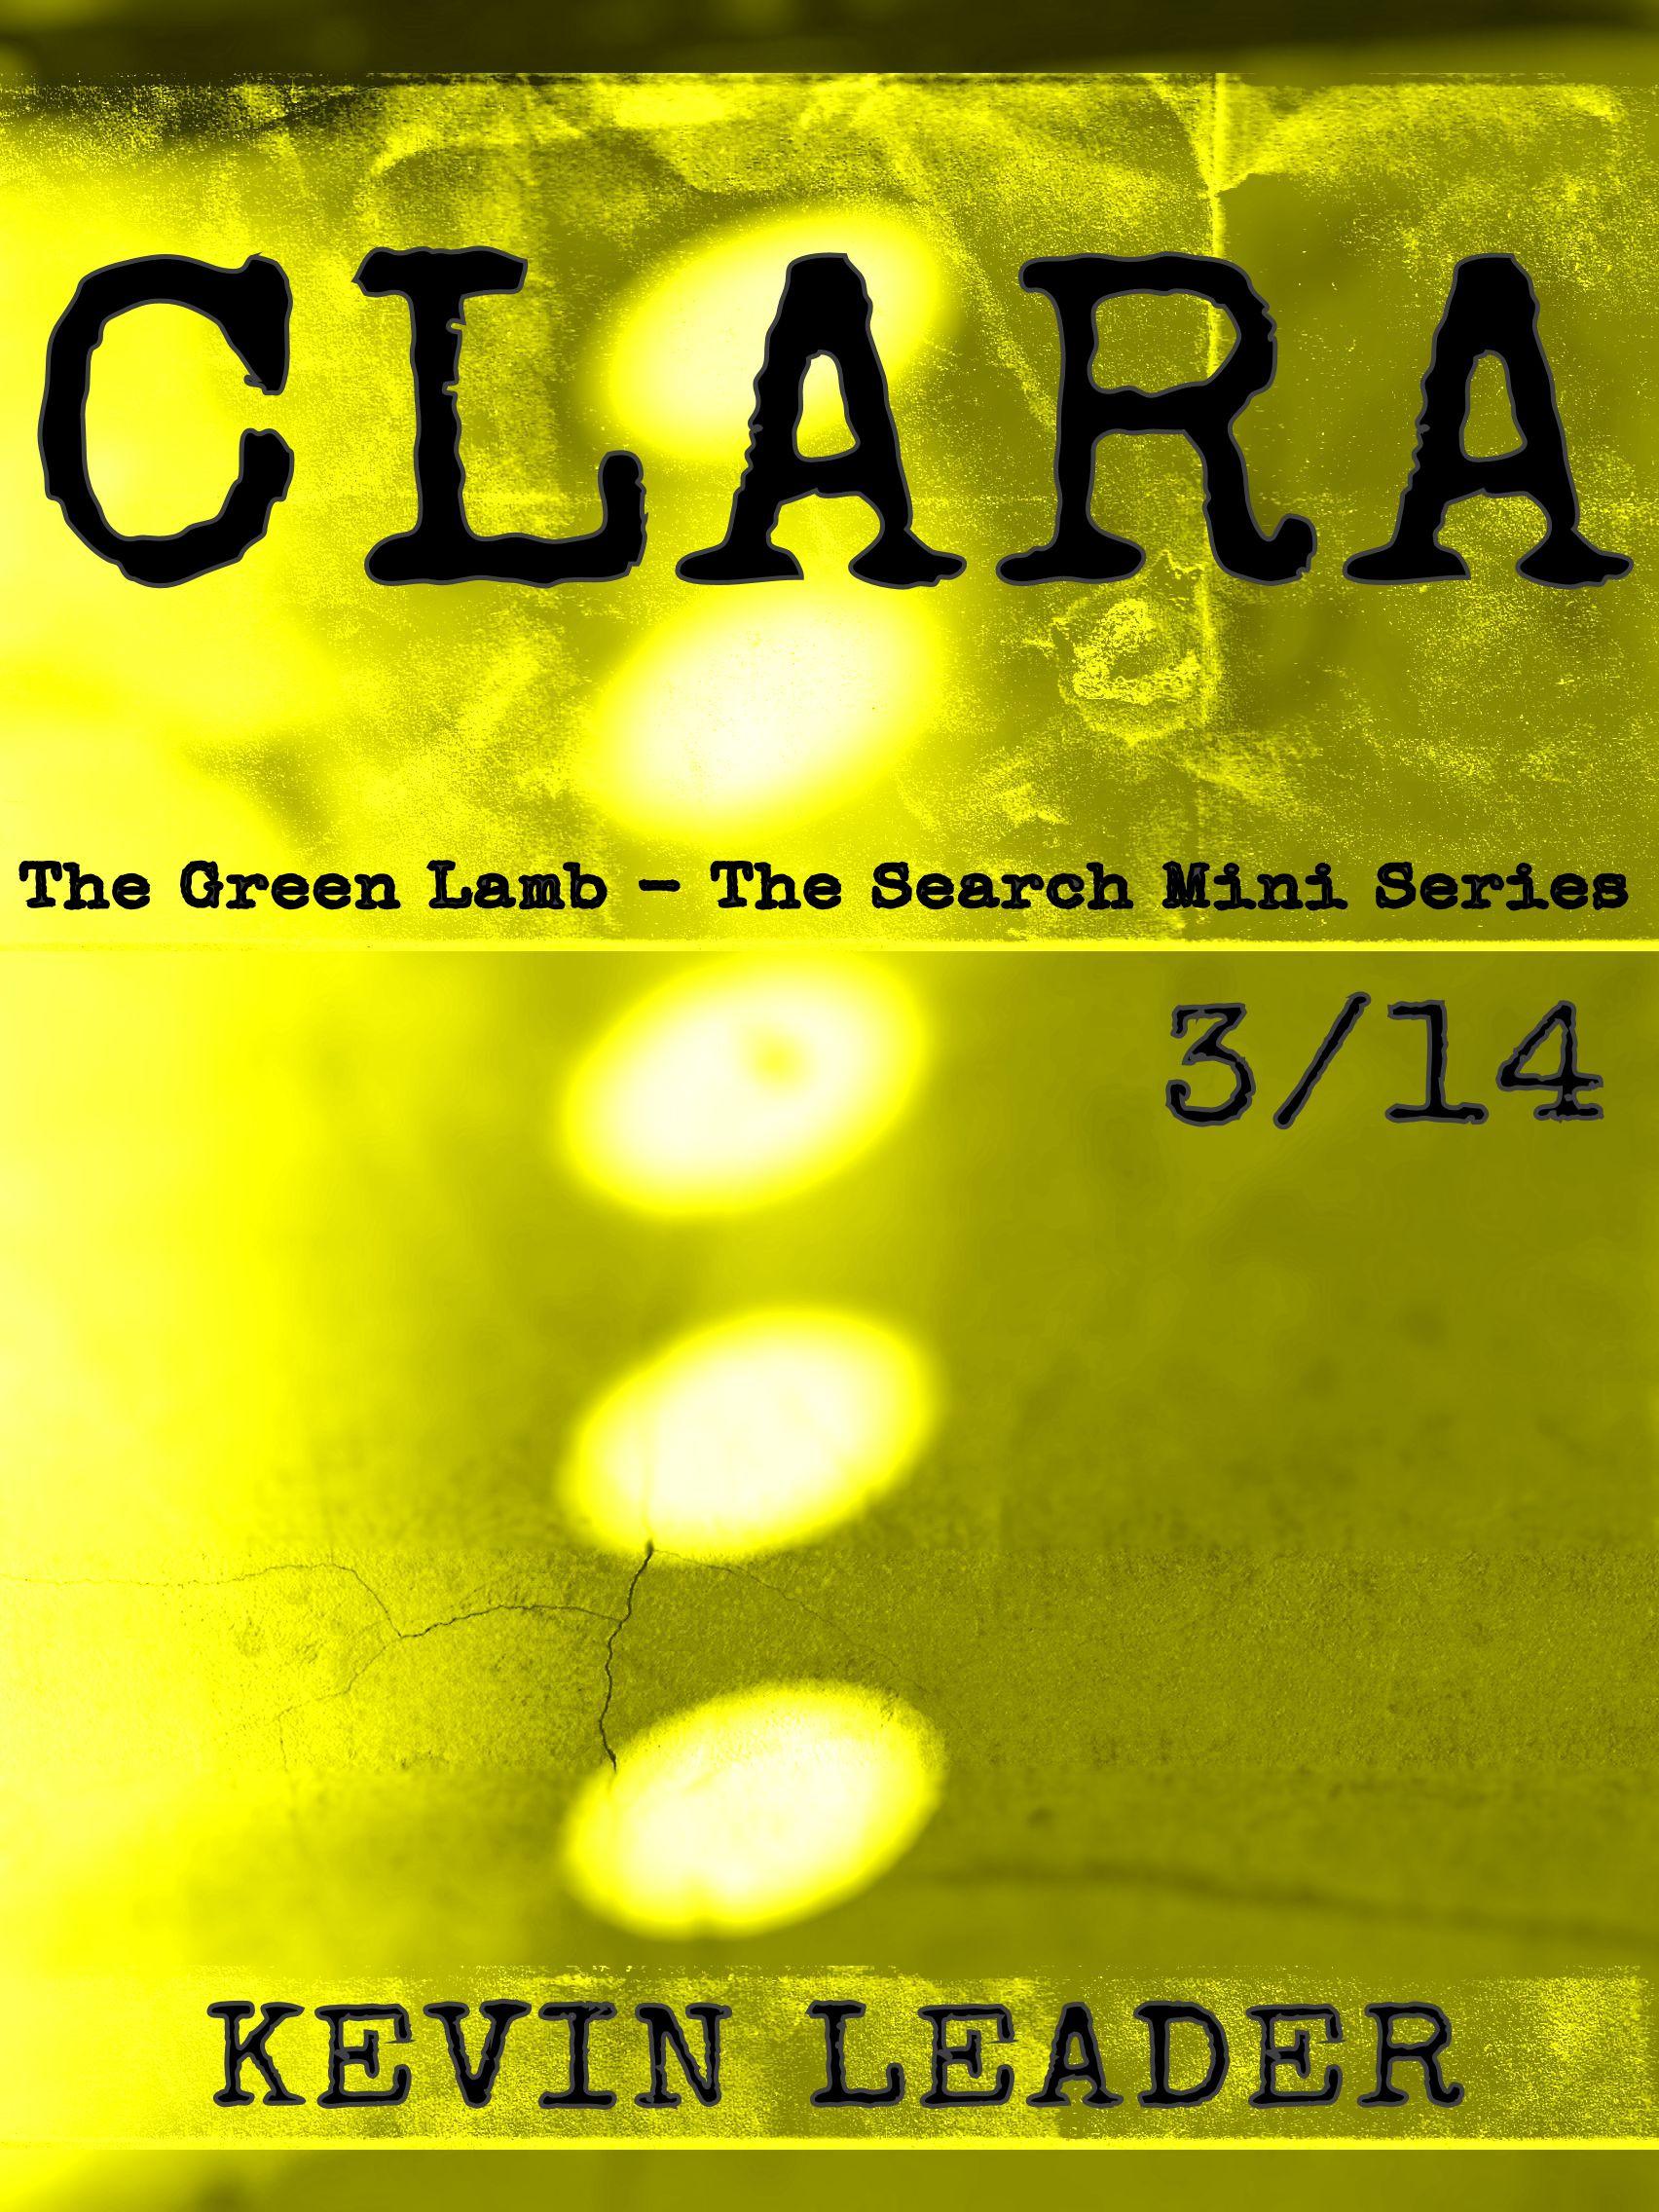 Kevin Leader - Clara (The Green Lamb - The Search Mini Series 3/14)